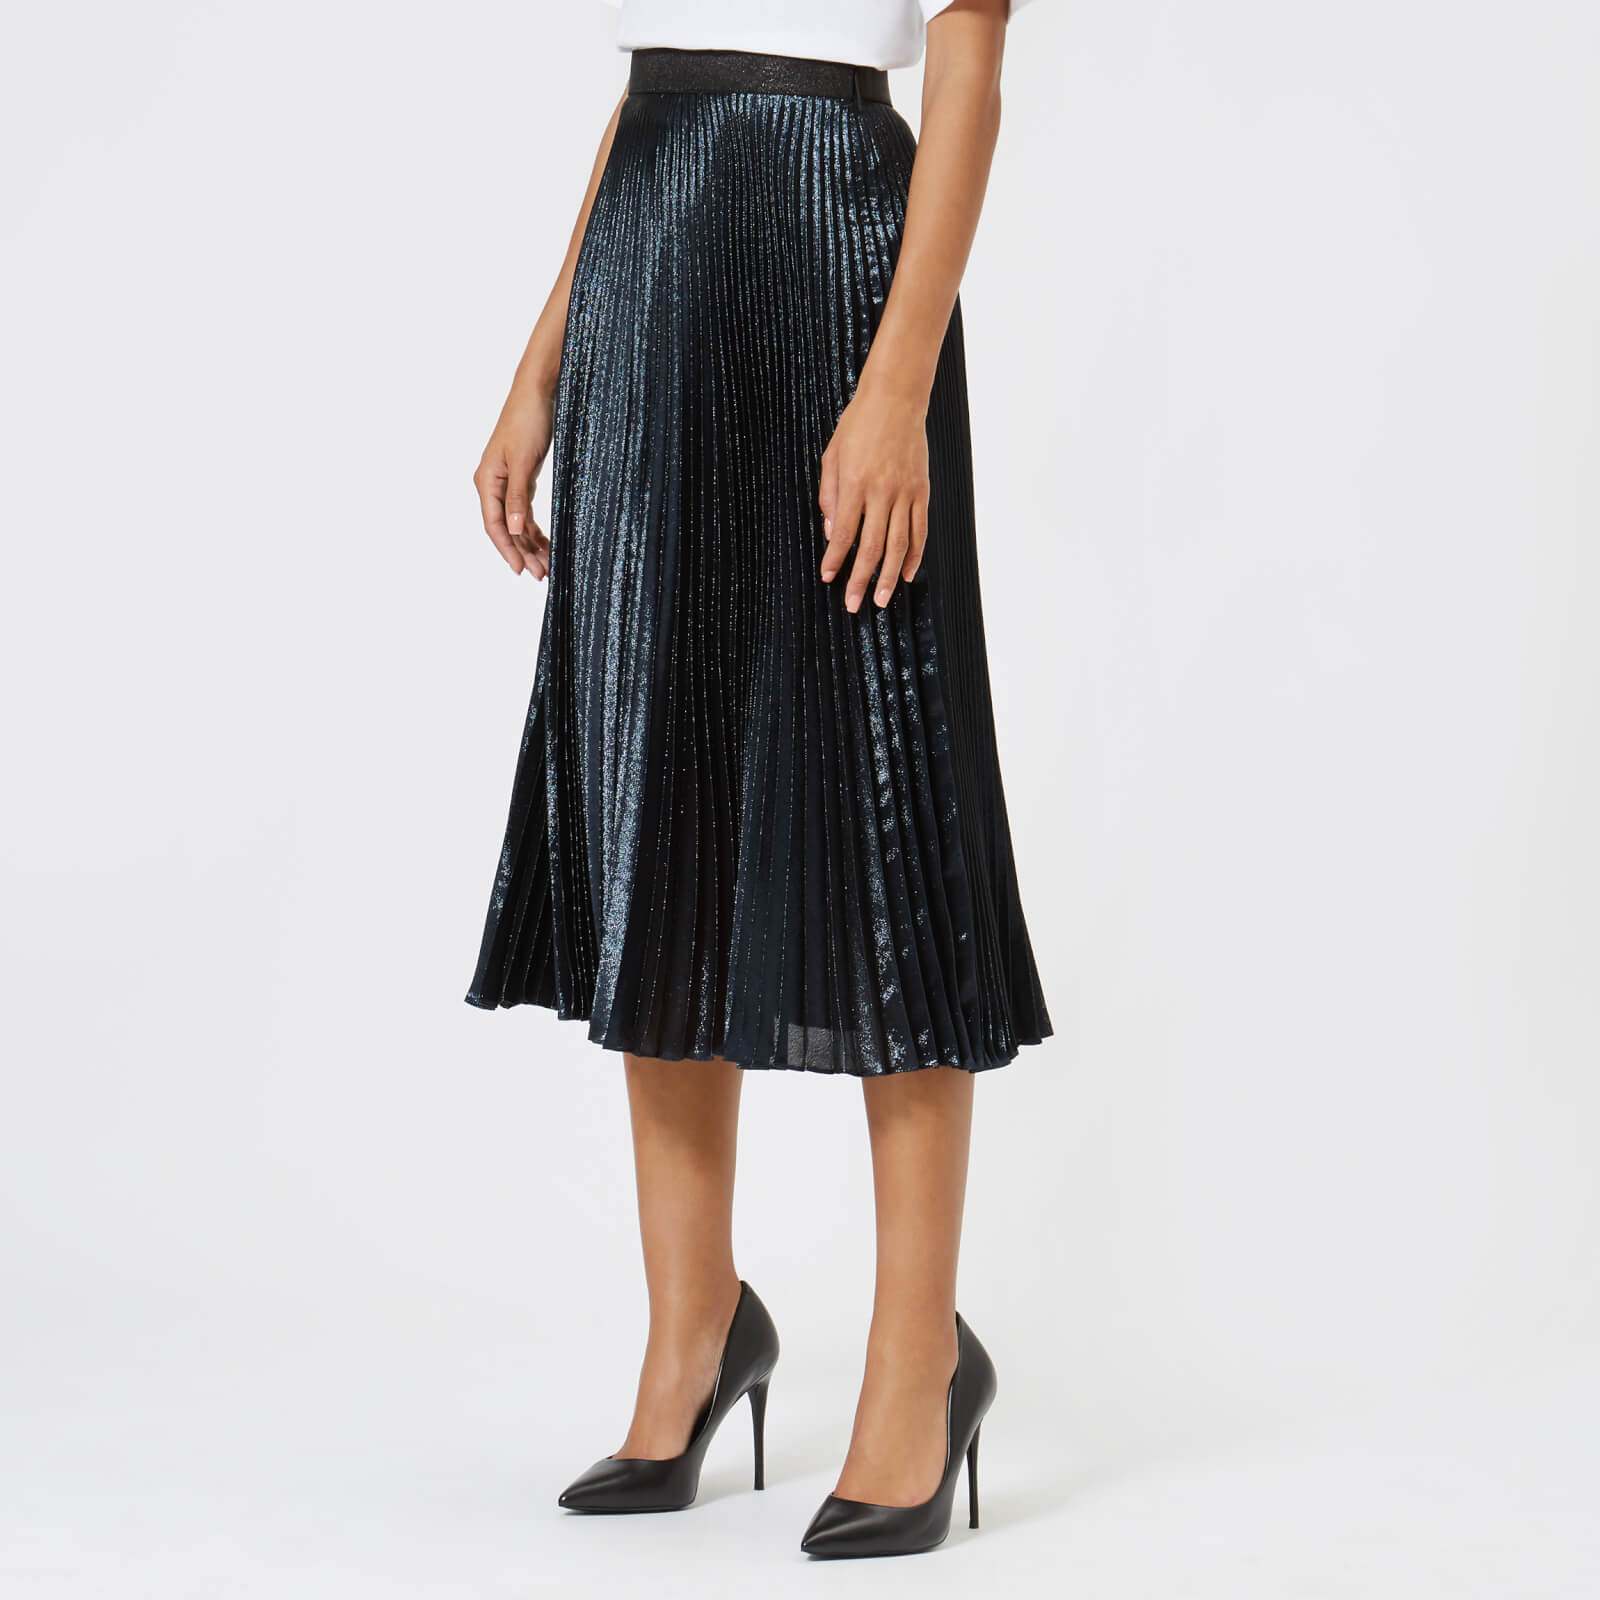 0d2dcaffb1 Christopher Kane Women's Lamé Pleated Skirt - Navy - Free UK ...